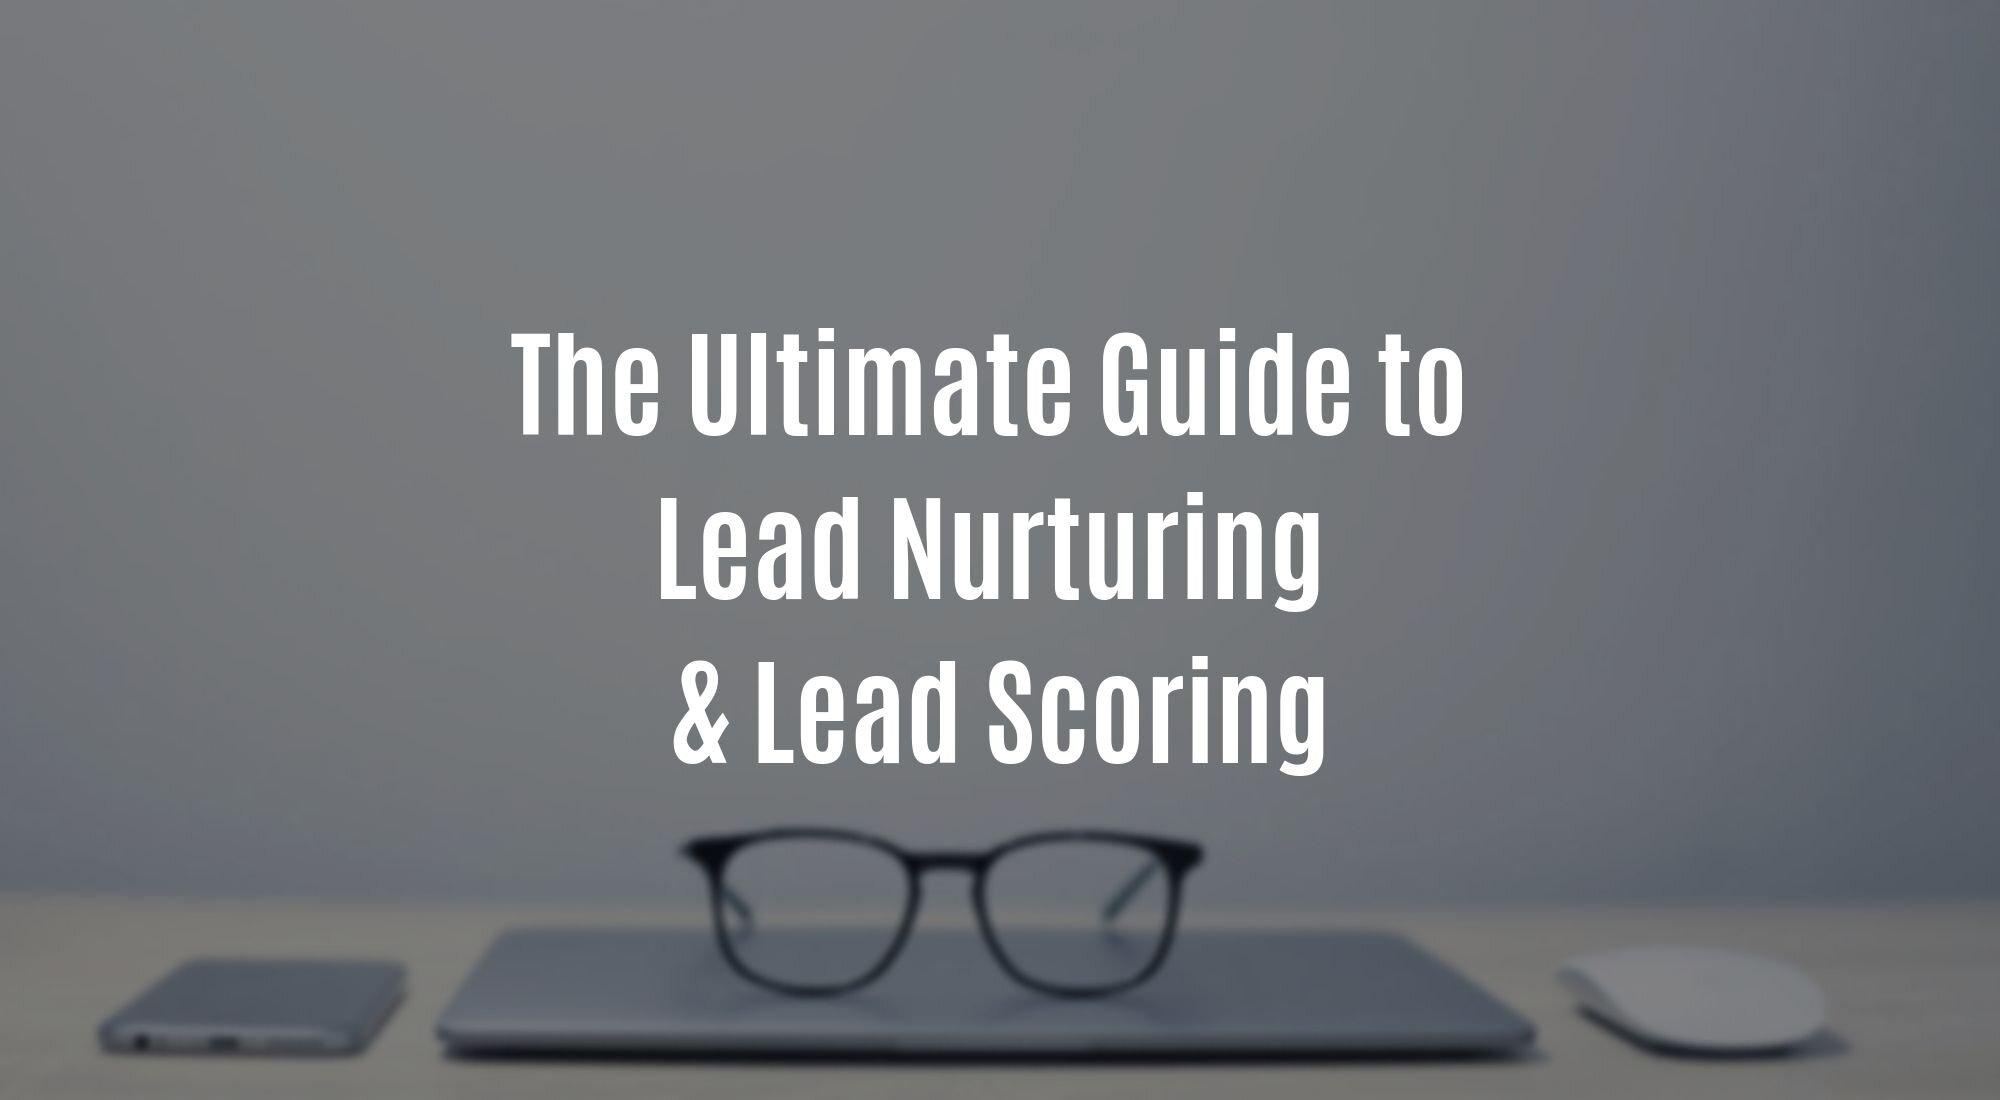 The Ultimate Guide to Lead Nurturing & Lead Scoring.jpg